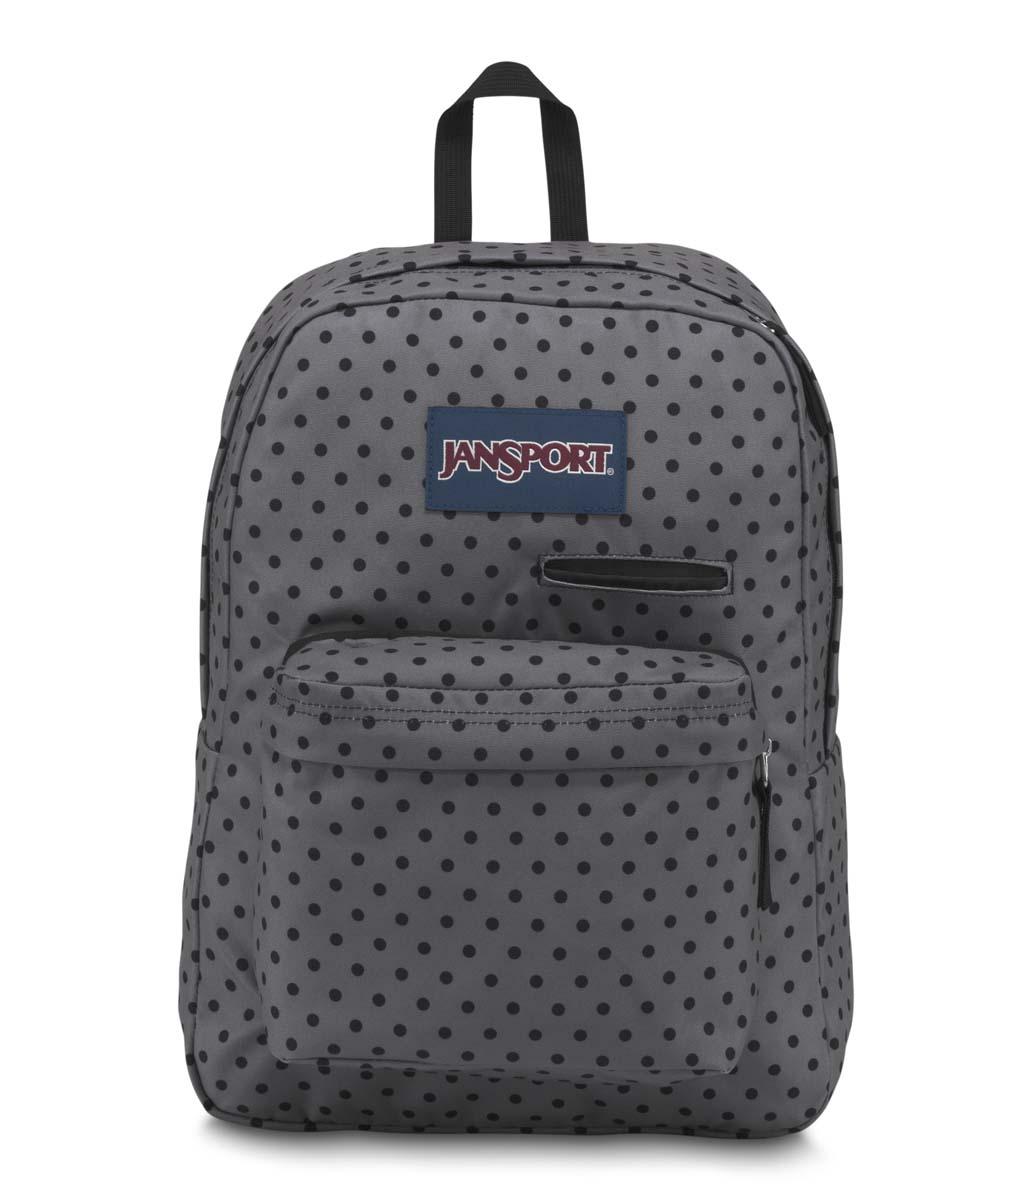 JanSport กระเป๋าเป้ JS00T50F35W รุ่น Digibreak - Black Dot-O-Rama